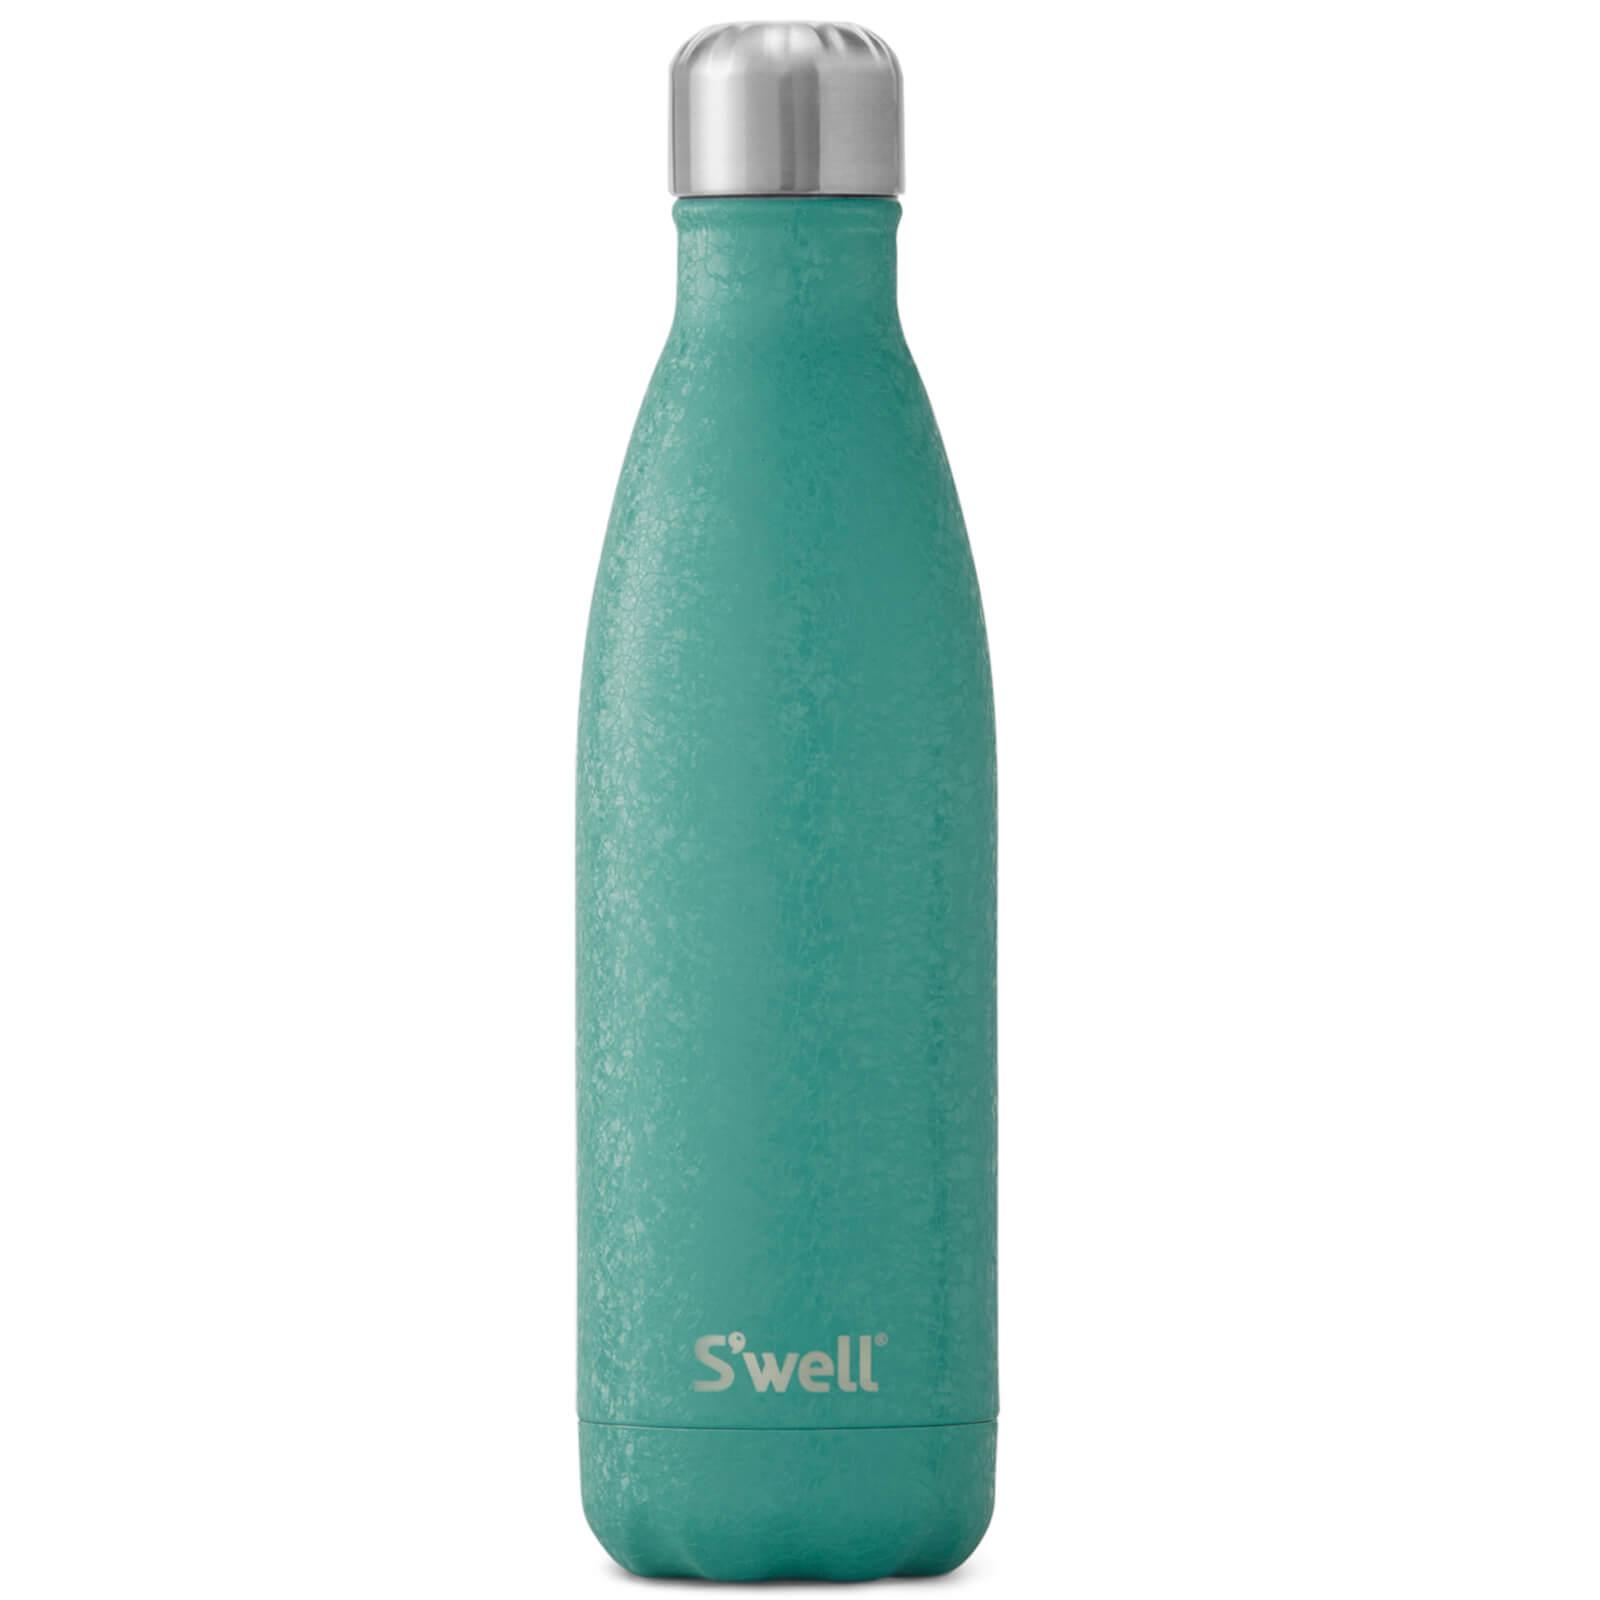 S'well Carbon Montana Blue Water Bottle - 500ml